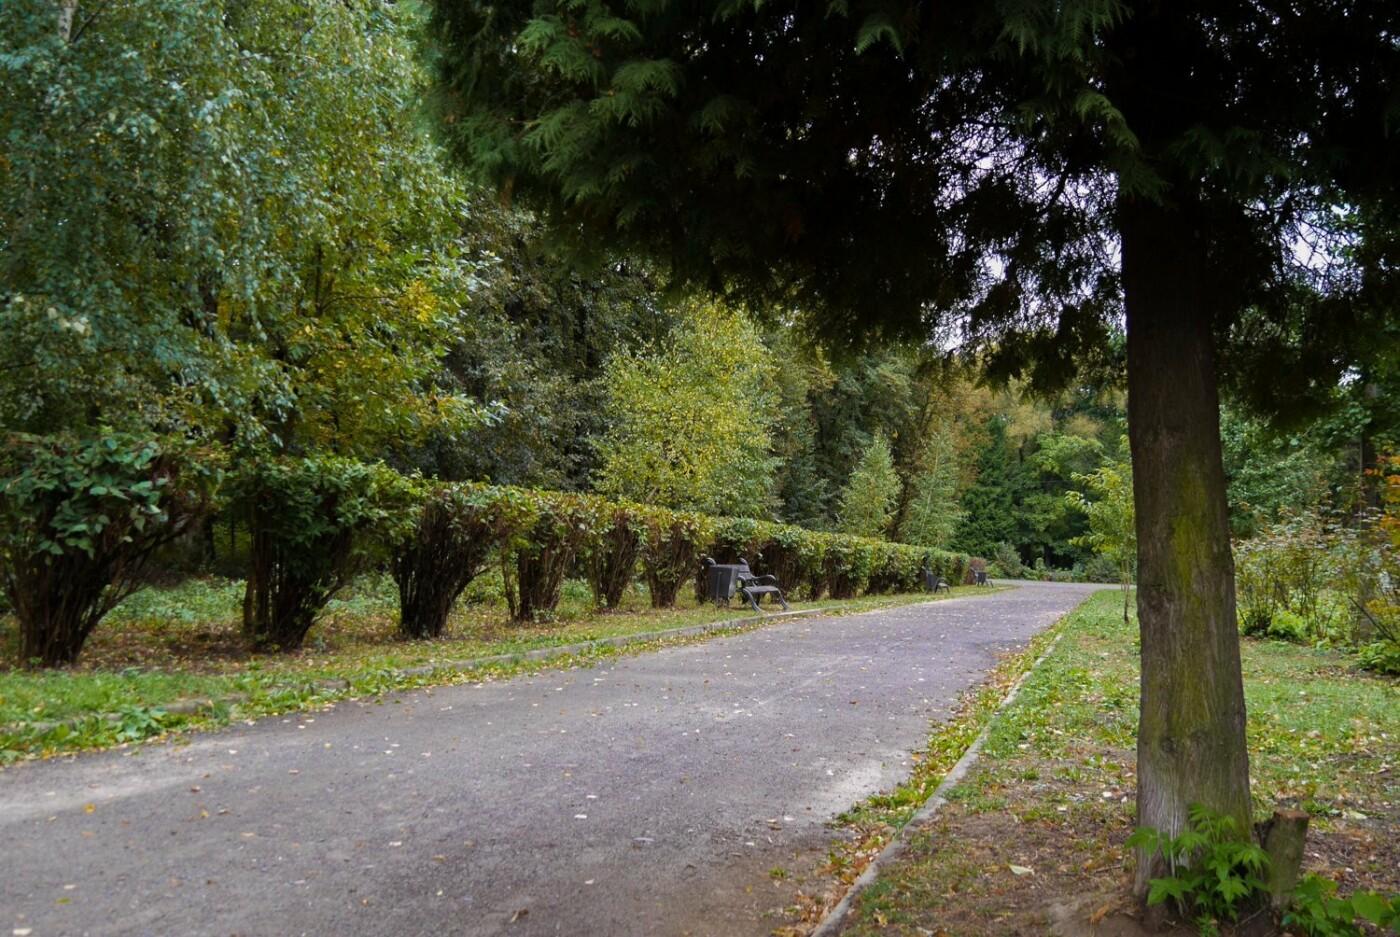 Ще одну алею у Боздоському парку Ужгорода привели до ладу (ФОТО), фото-2